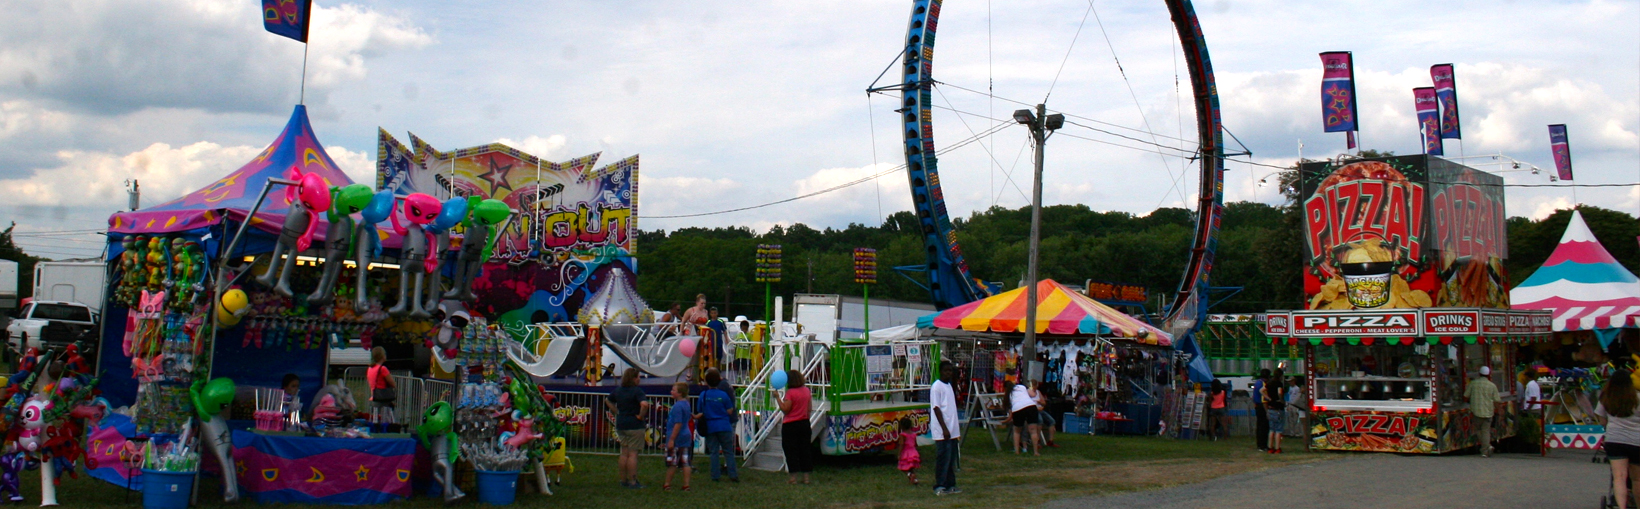 State Fair Media Credentials - Indiana State Fair .